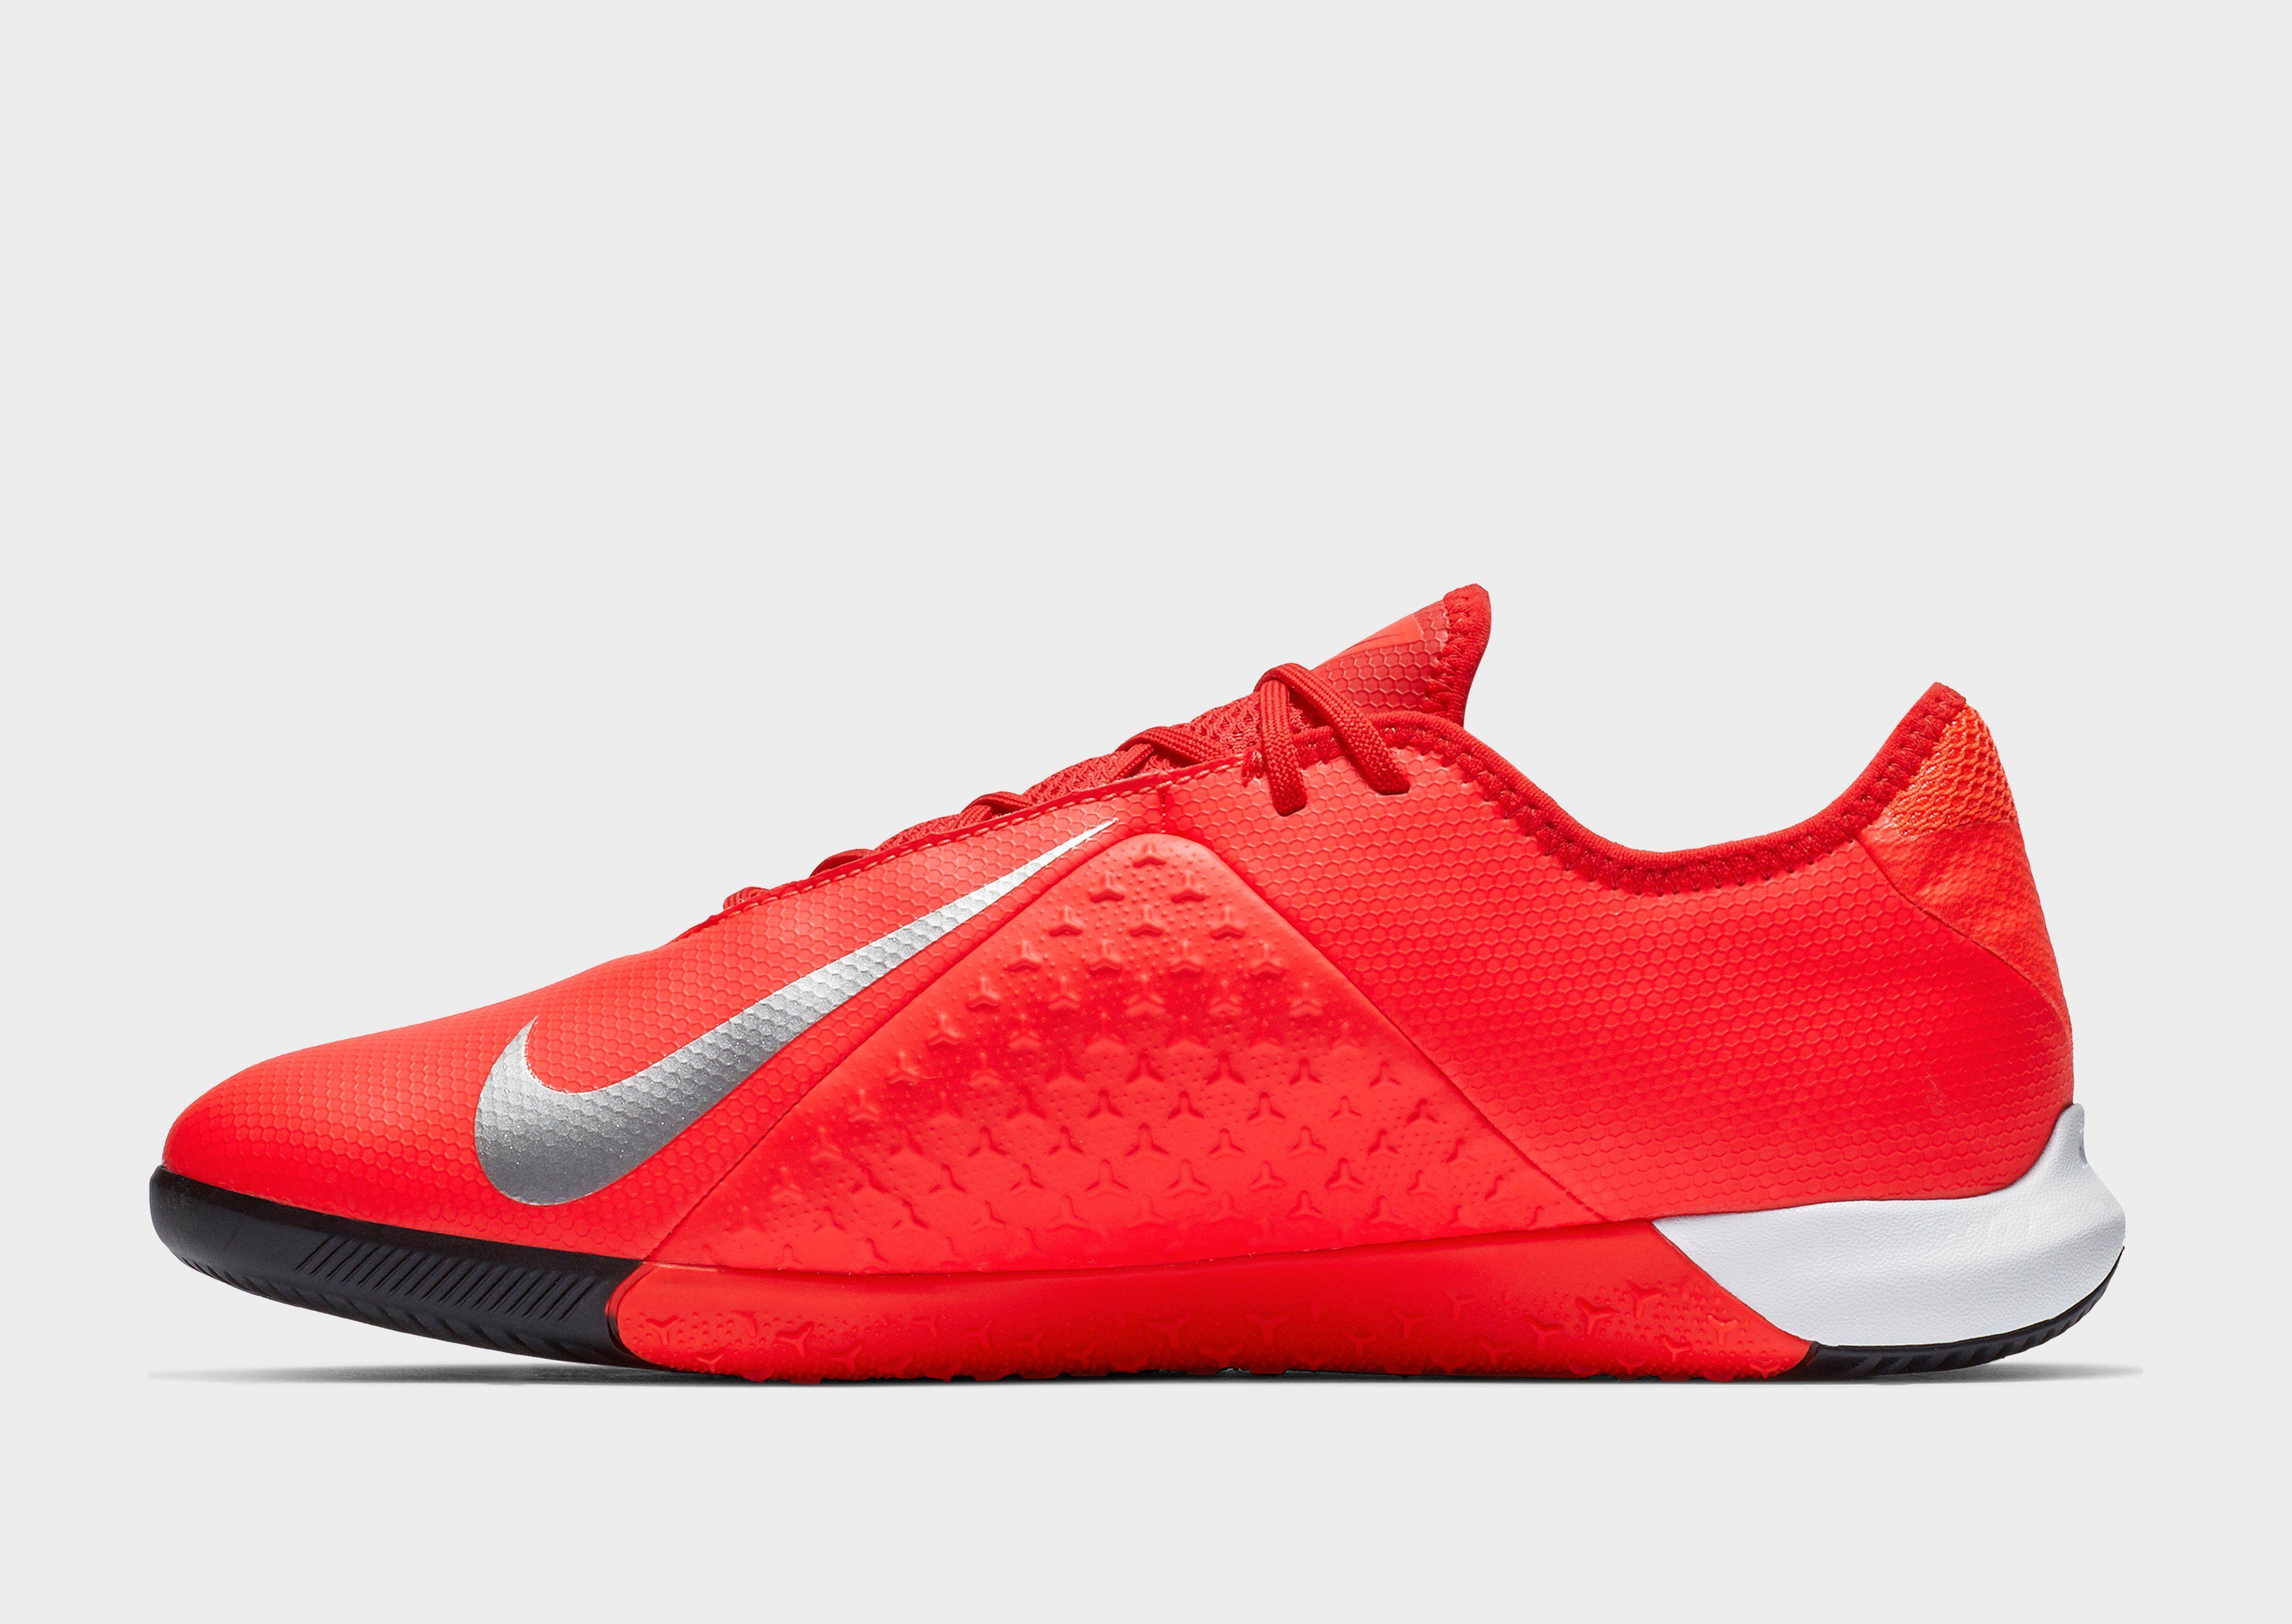 NIKE Nike PhantomVSN Academy Game Over IC Indoor/Court Football Boot